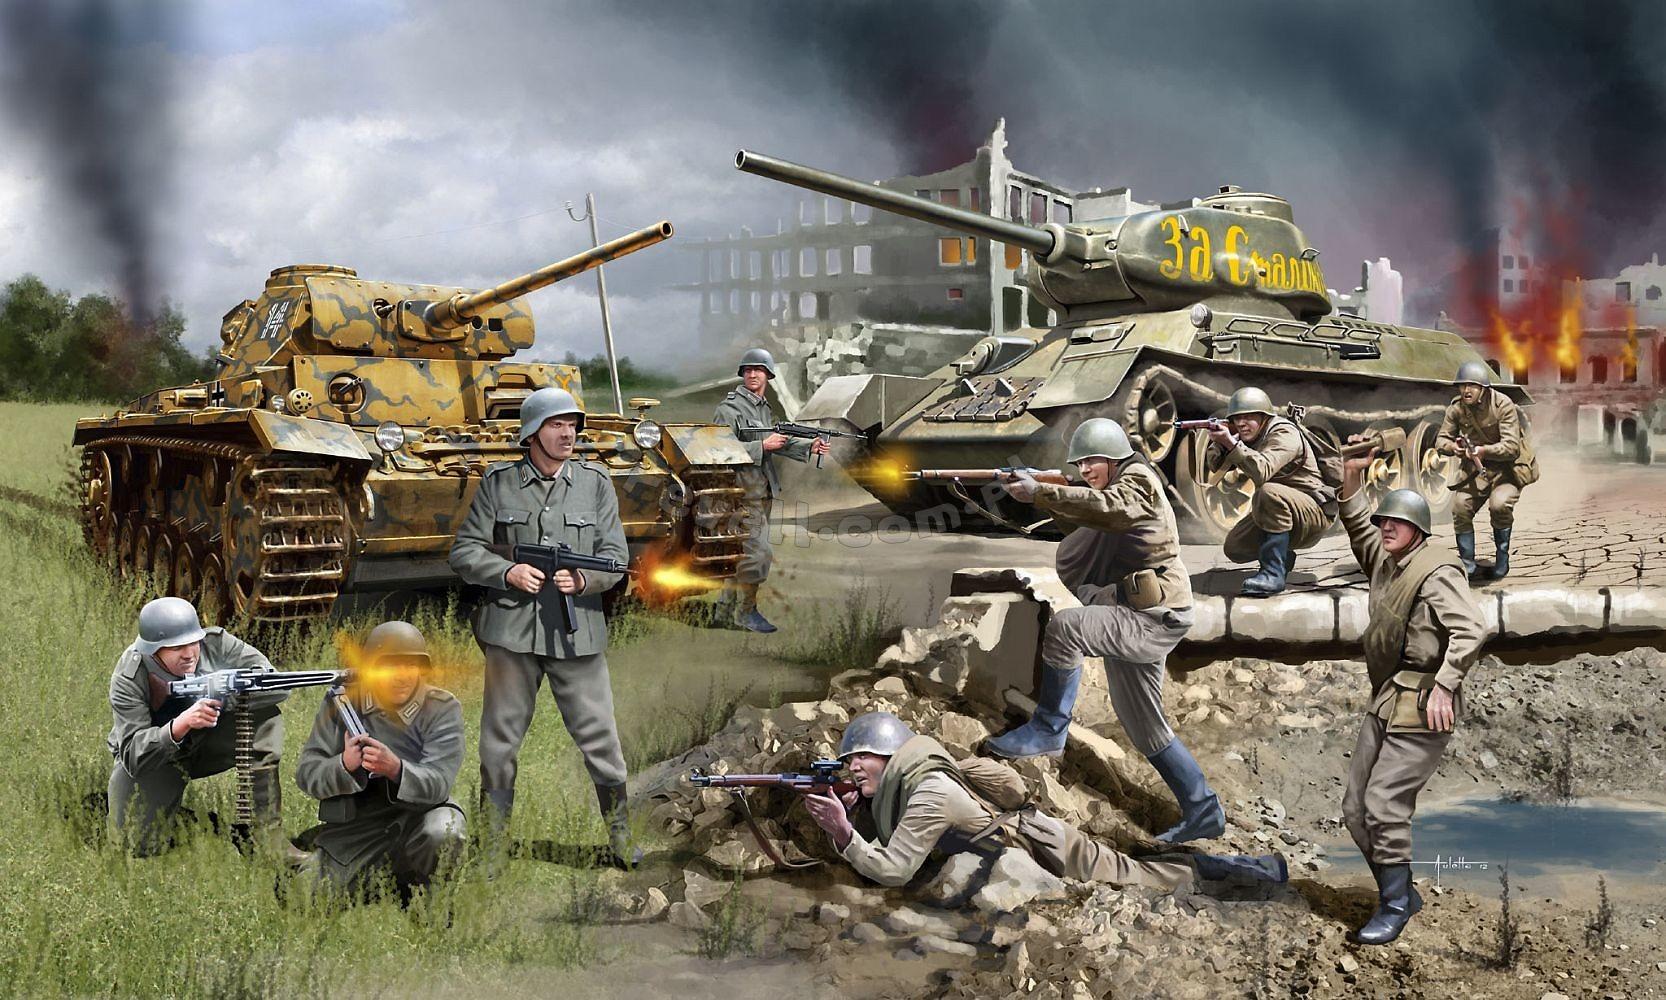 produkt archiwalny stalingrad battle pzkpfw iii amp t34